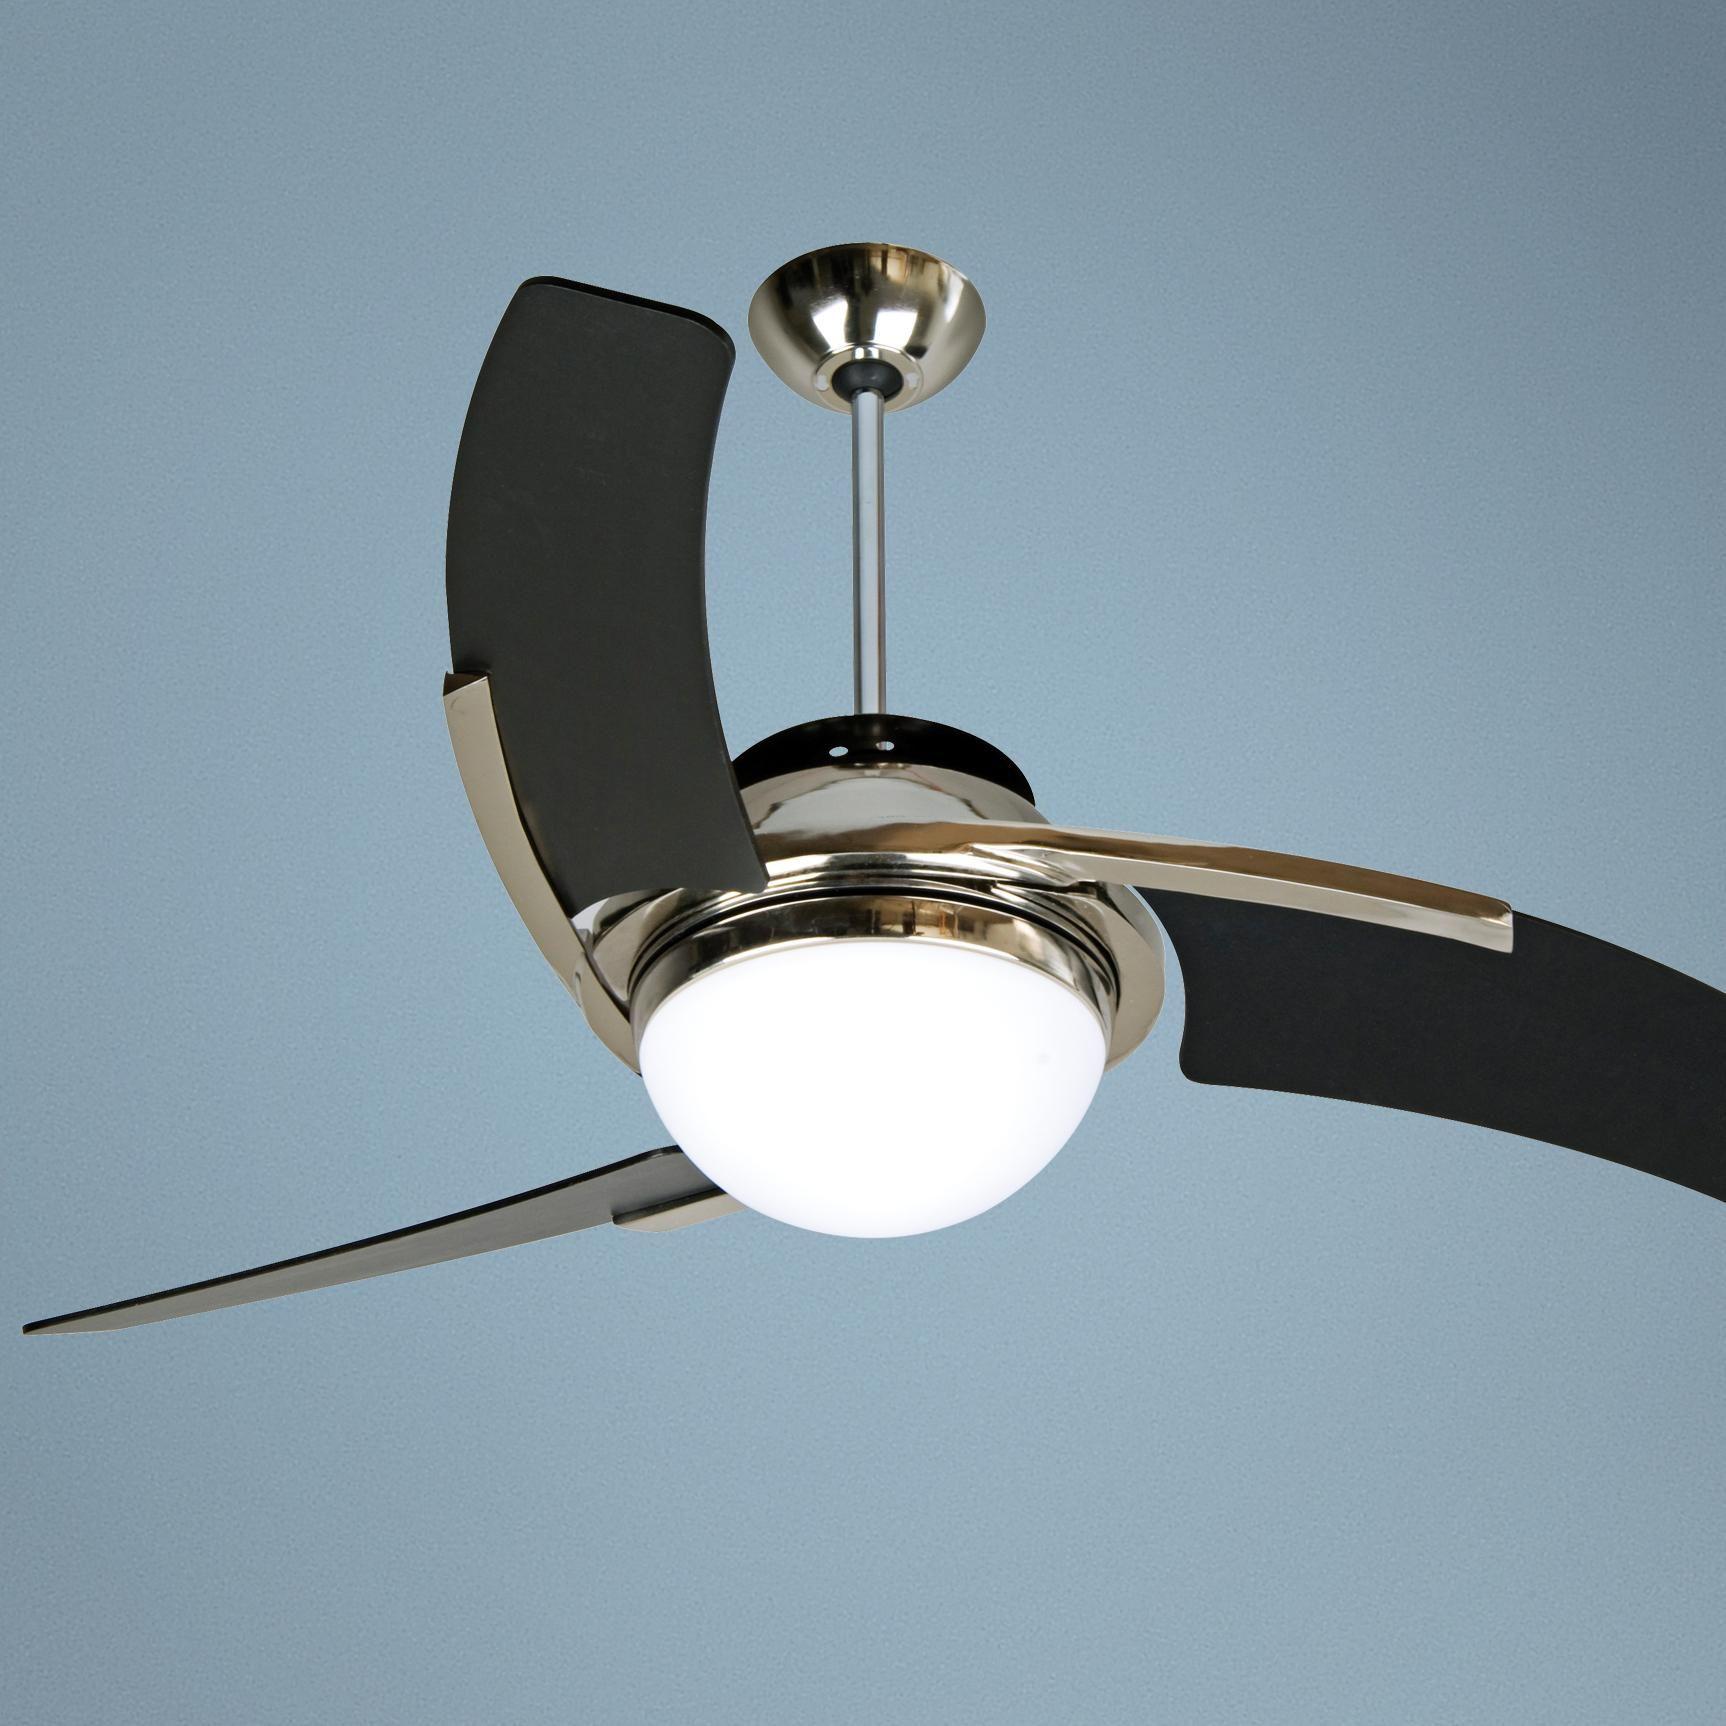 54 Craftmade Juna Polished Nickel Ceiling Fan